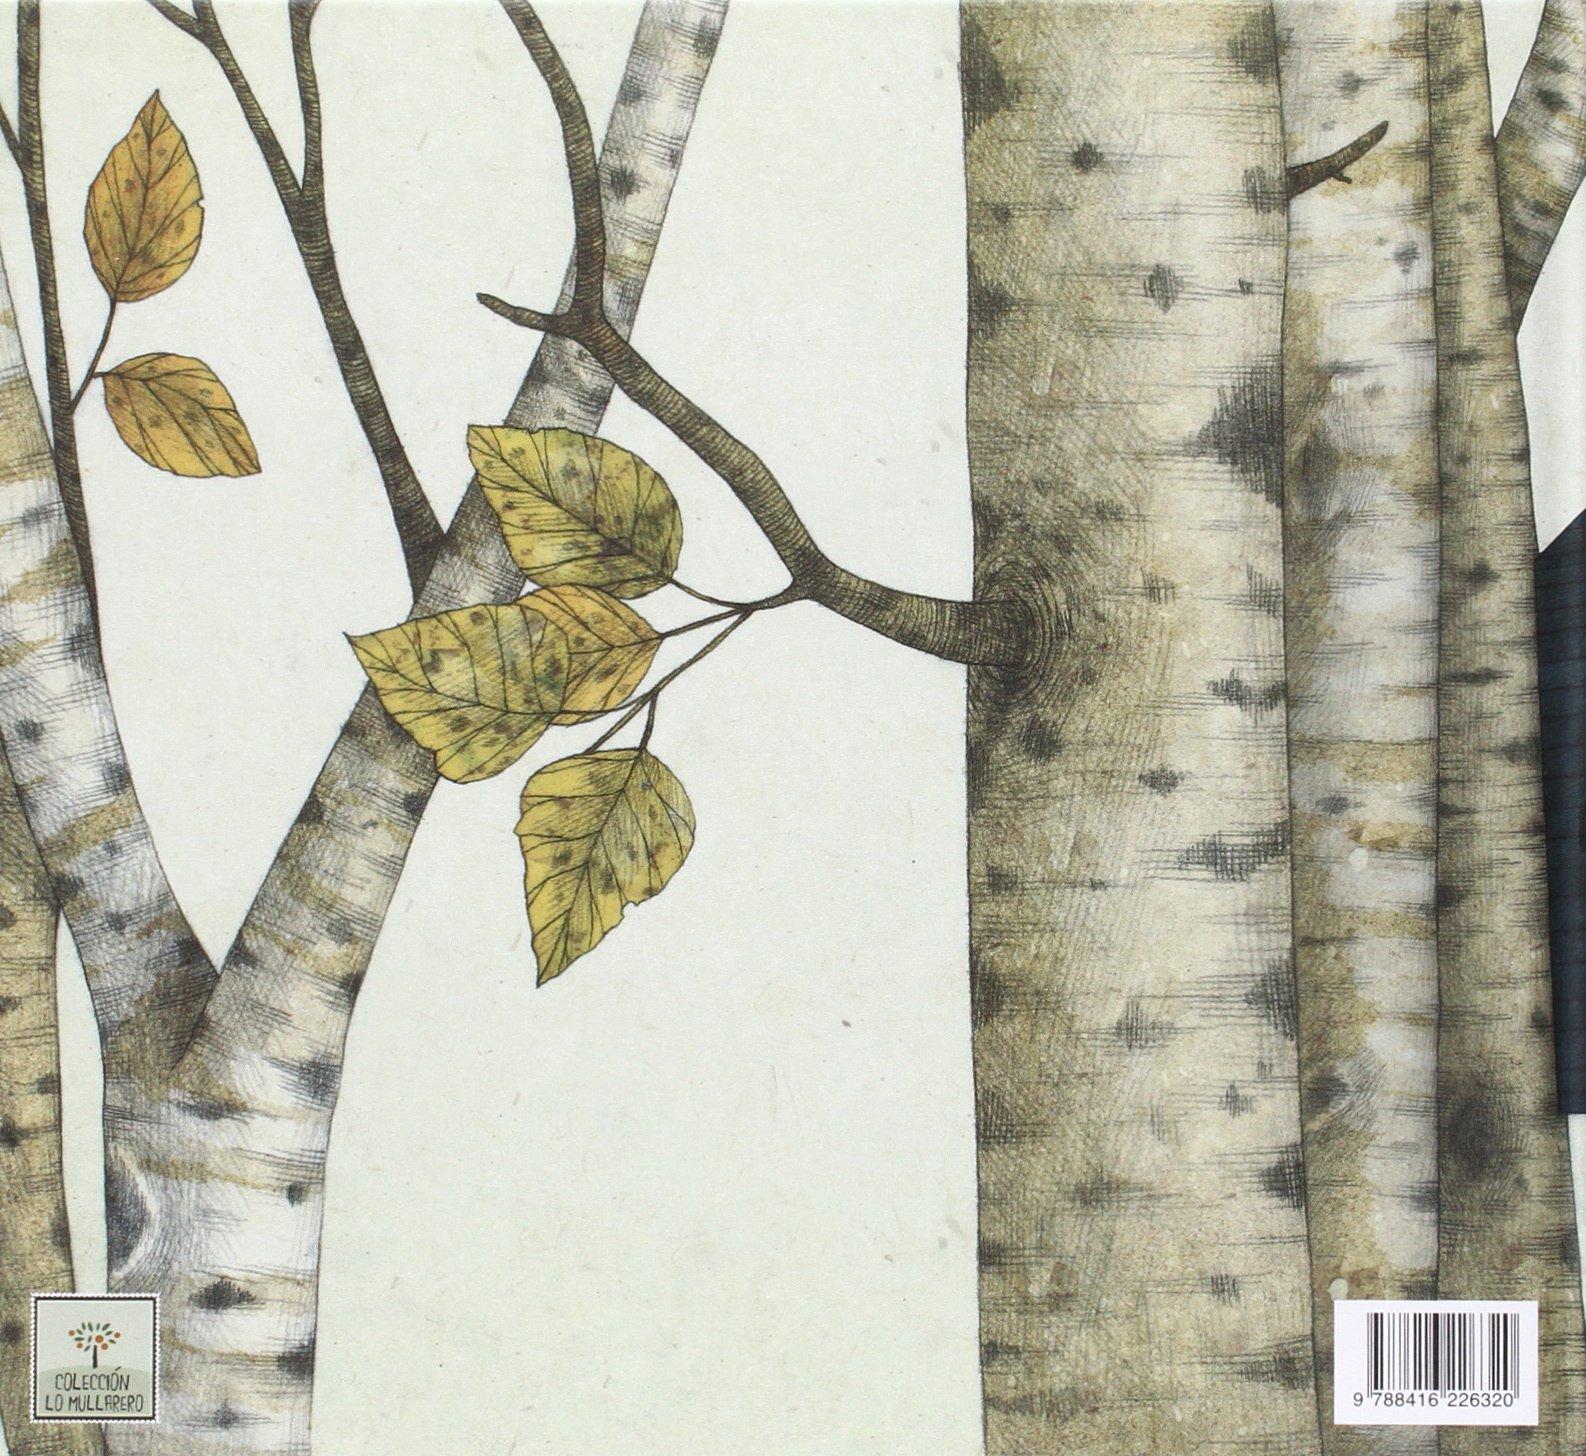 El momento perfecto (Lo Mullarero) (Spanish Edition): Susanna Isern Iñigo, Marco Somà: 9788416226320: Amazon.com: Books